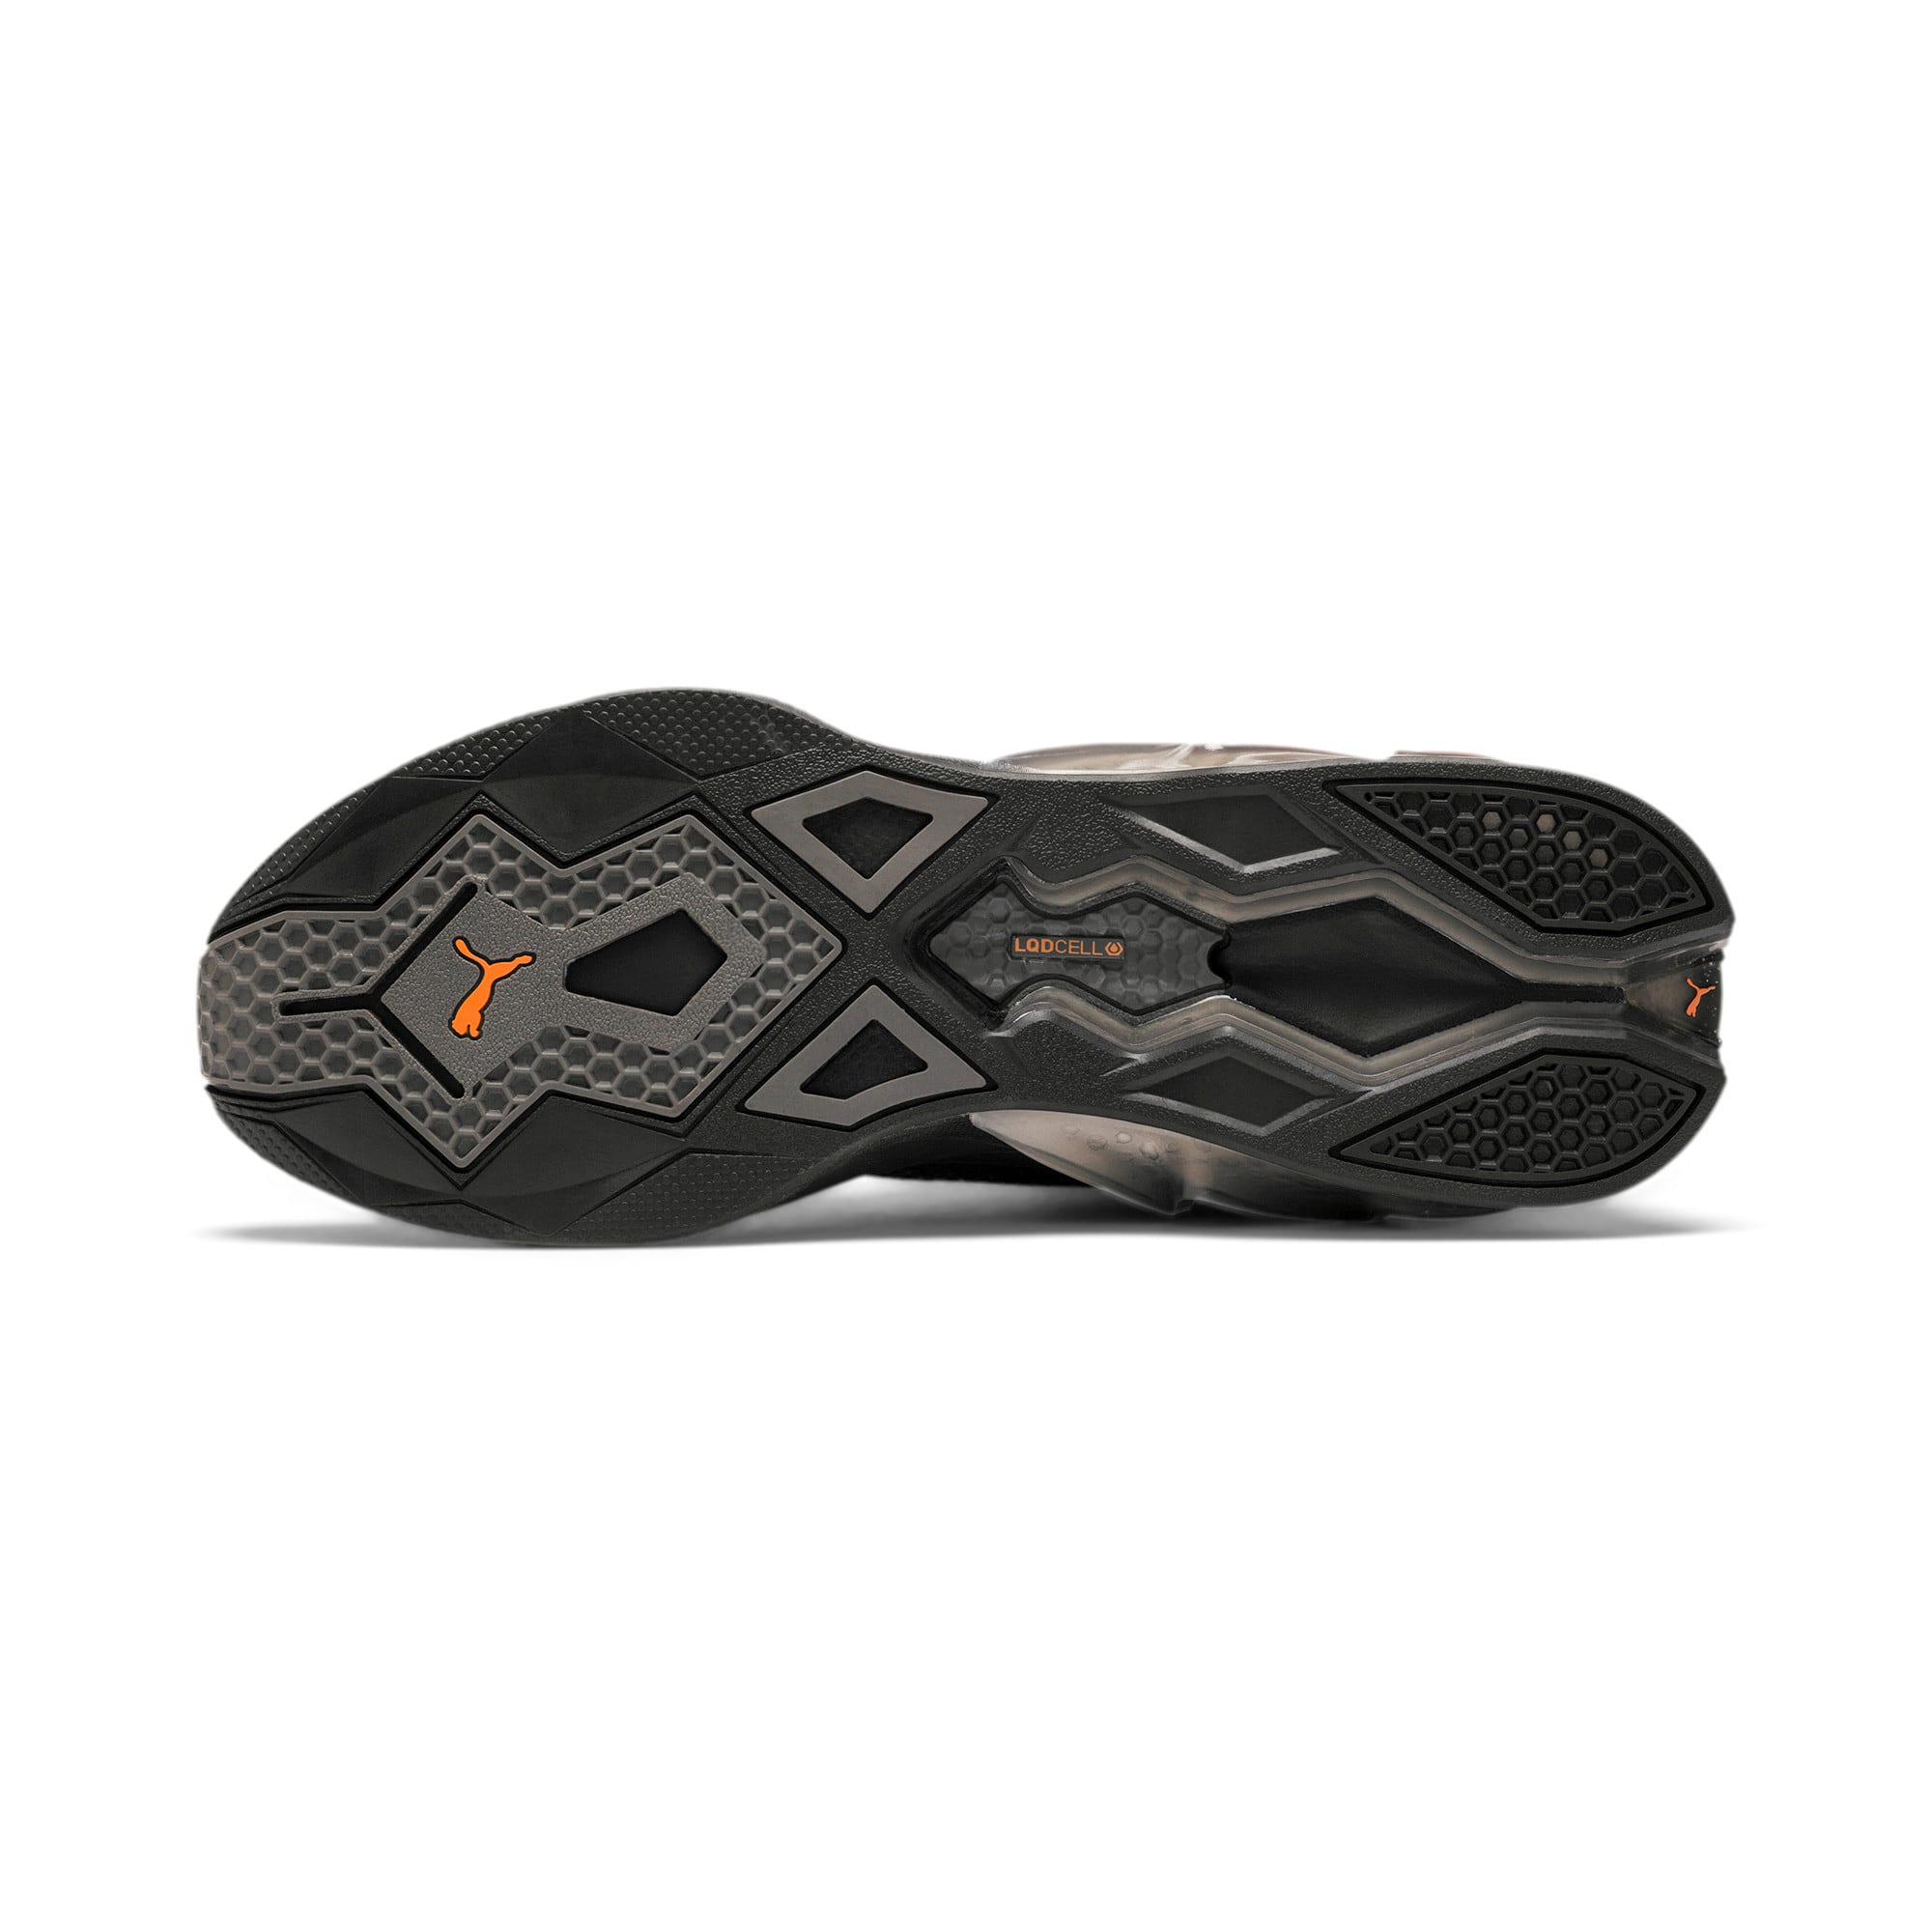 Thumbnail 5 of LQDCELL Origin Terrain Men's Training Shoes, Puma Black-Jaffa Orange, medium